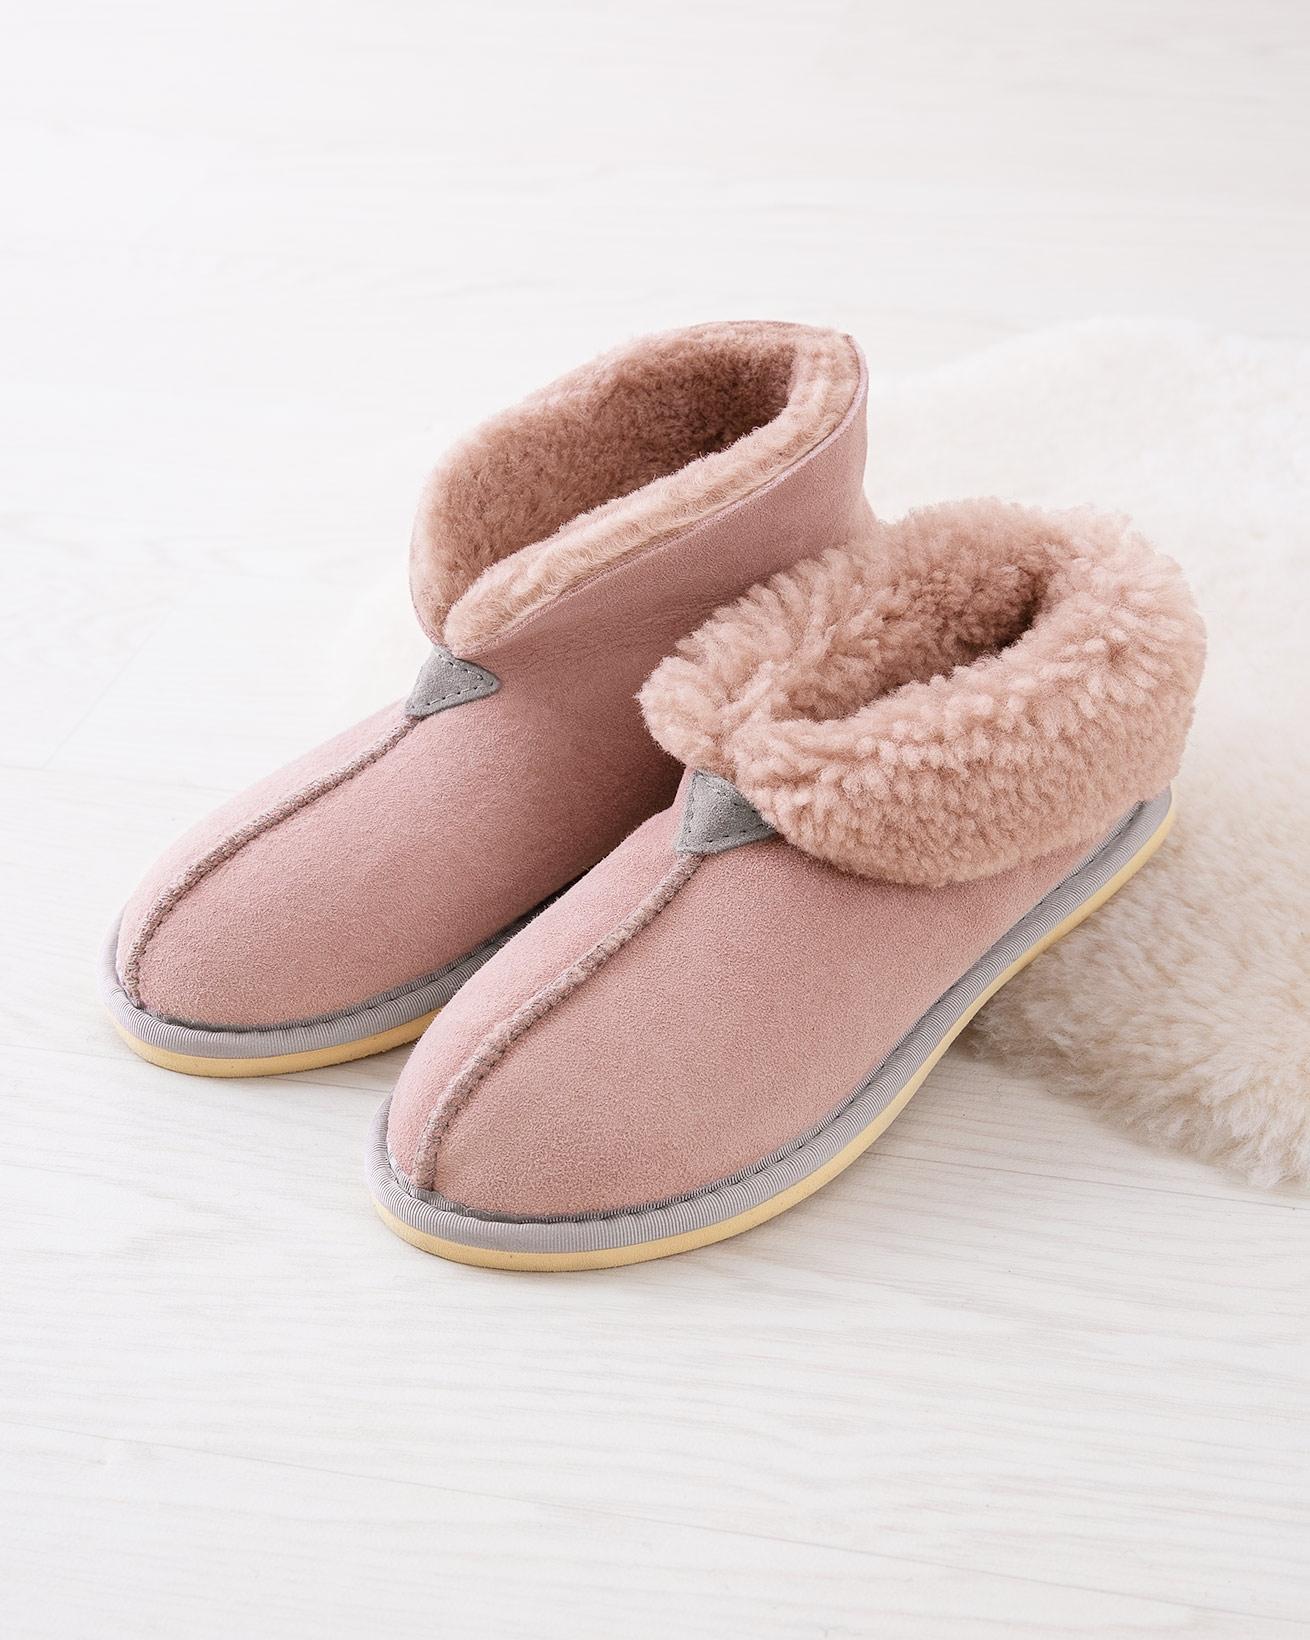 Ladies' Sheepskin Bootee Slippers